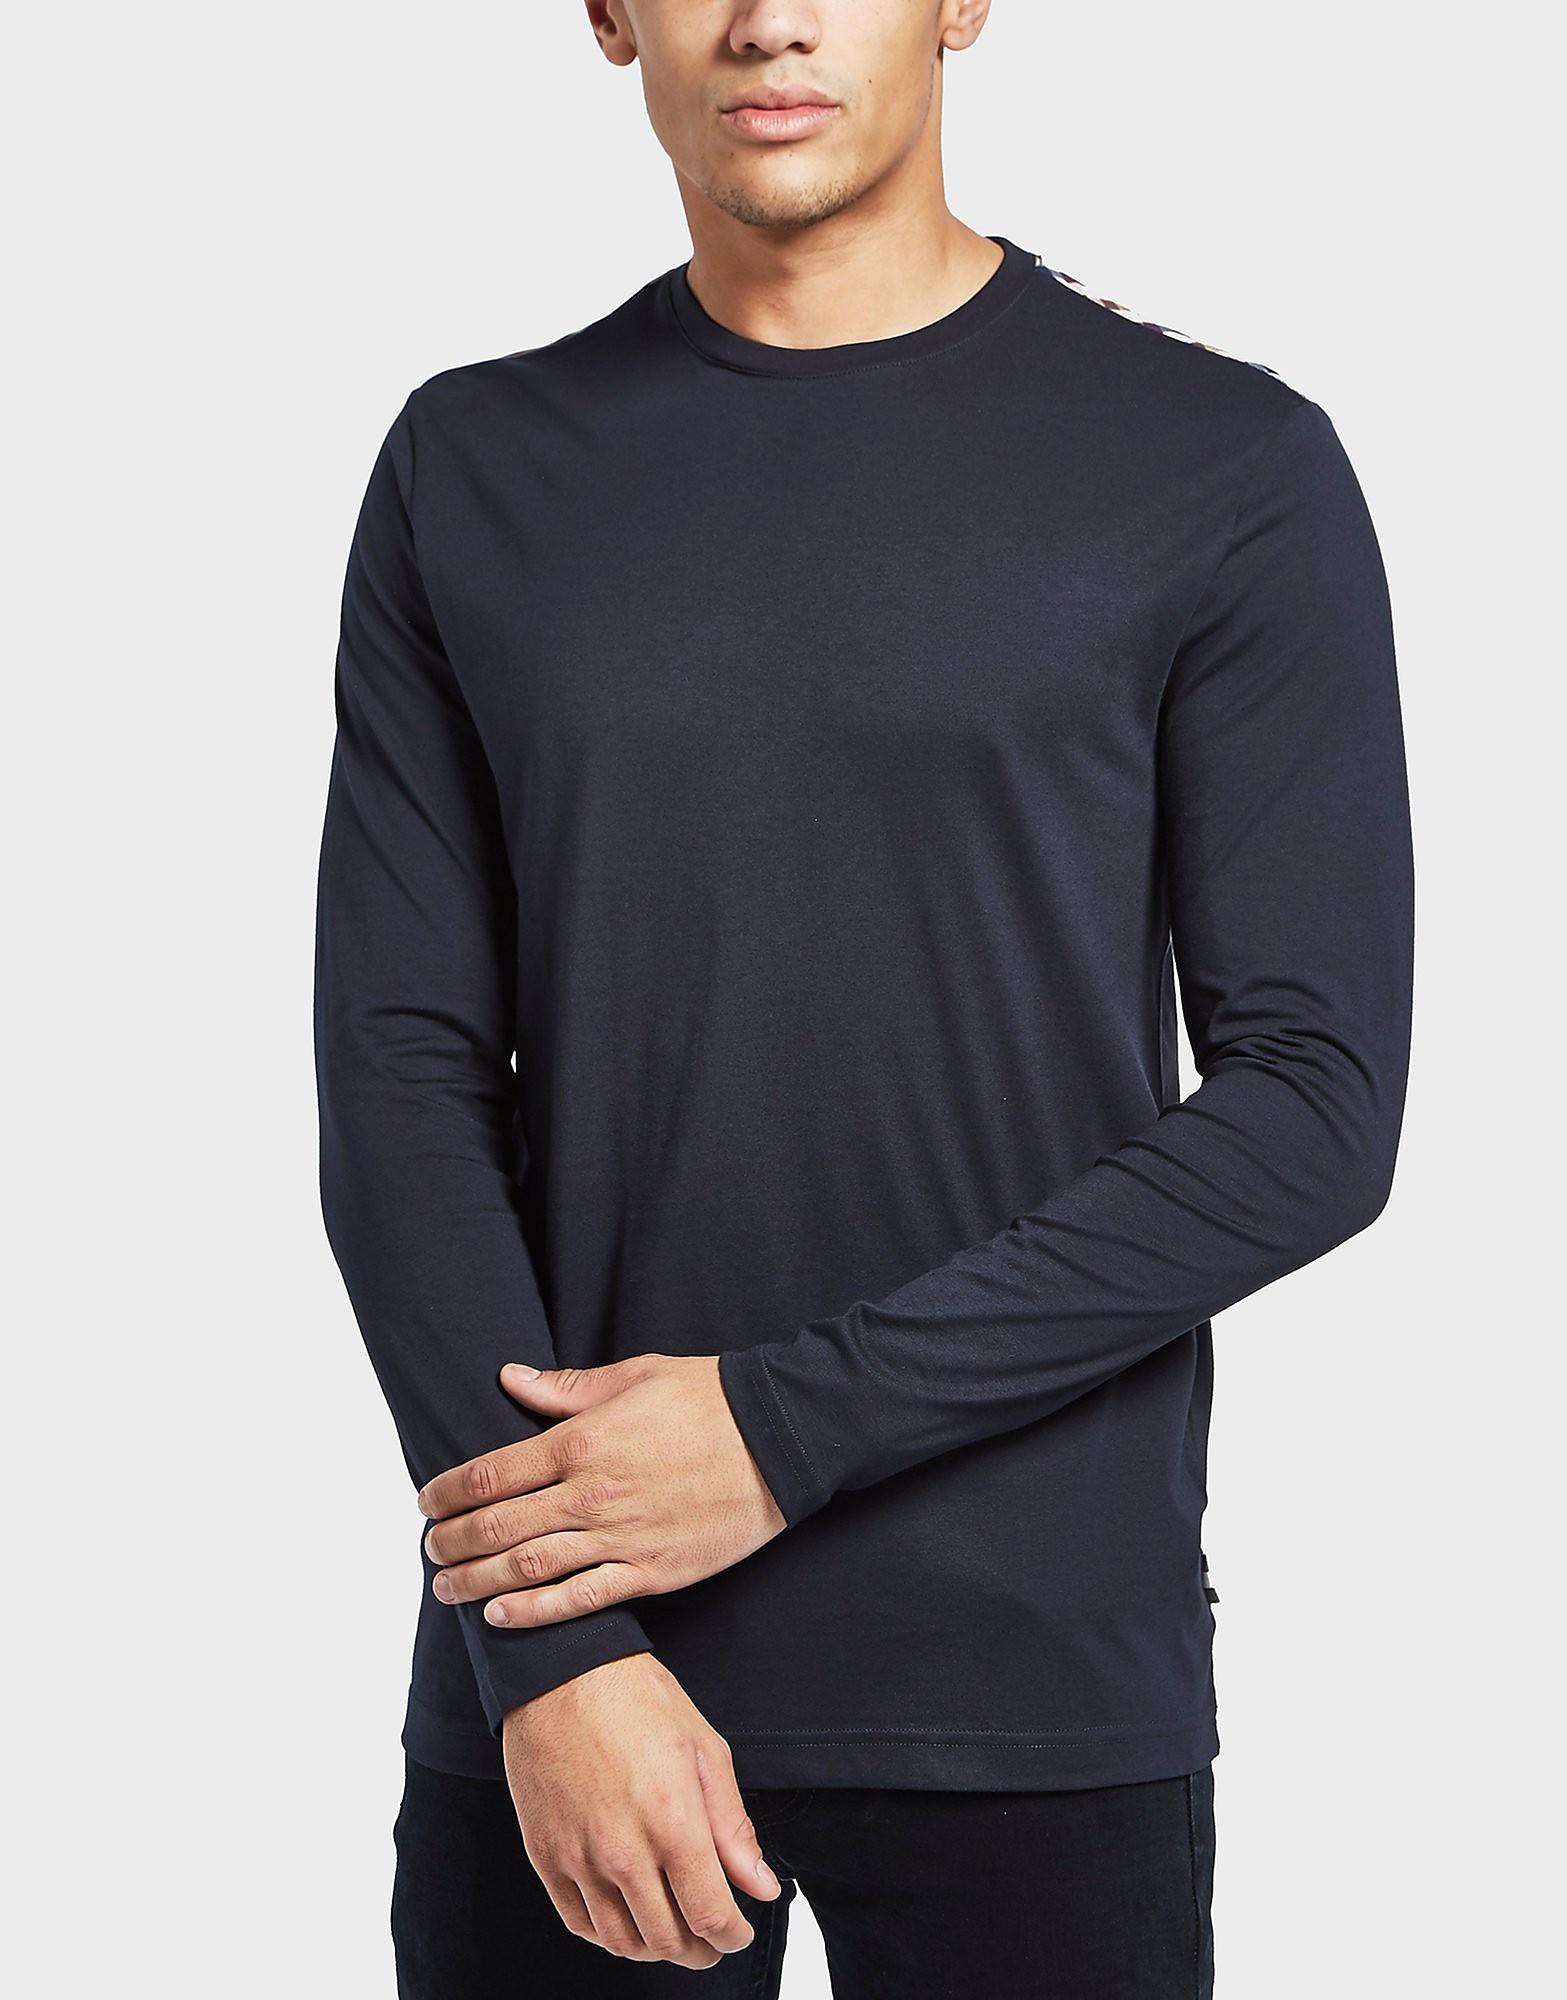 Aquascutum Southport Long Sleeve T-Shirt